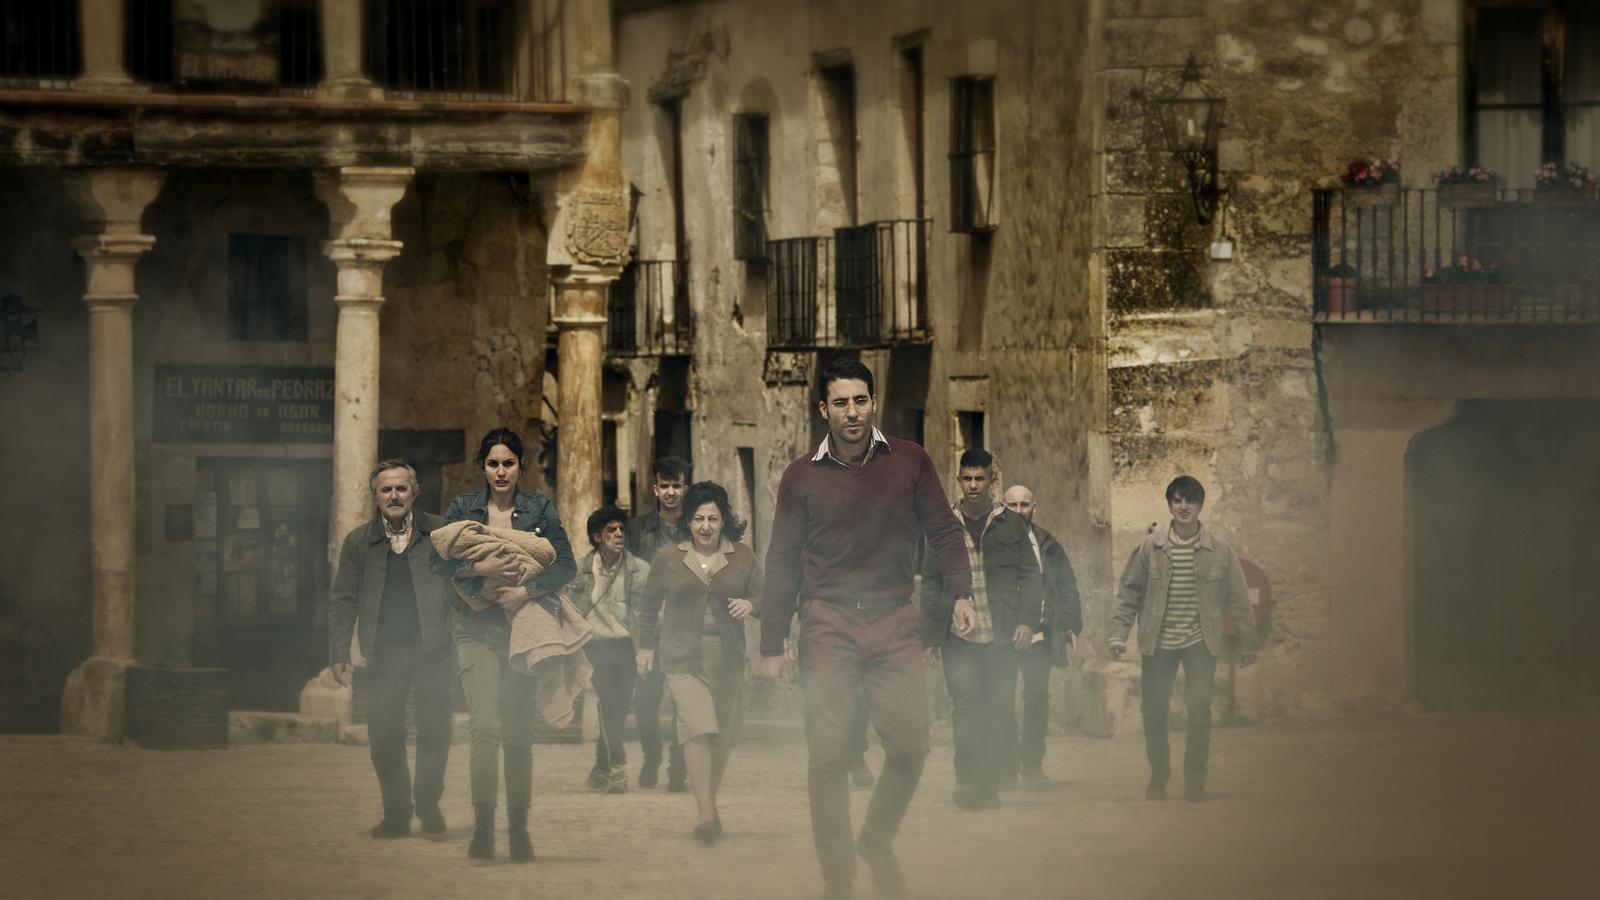 '30 monedas', el festival de terror d'Álex de la Iglesia, arriba a la HBO